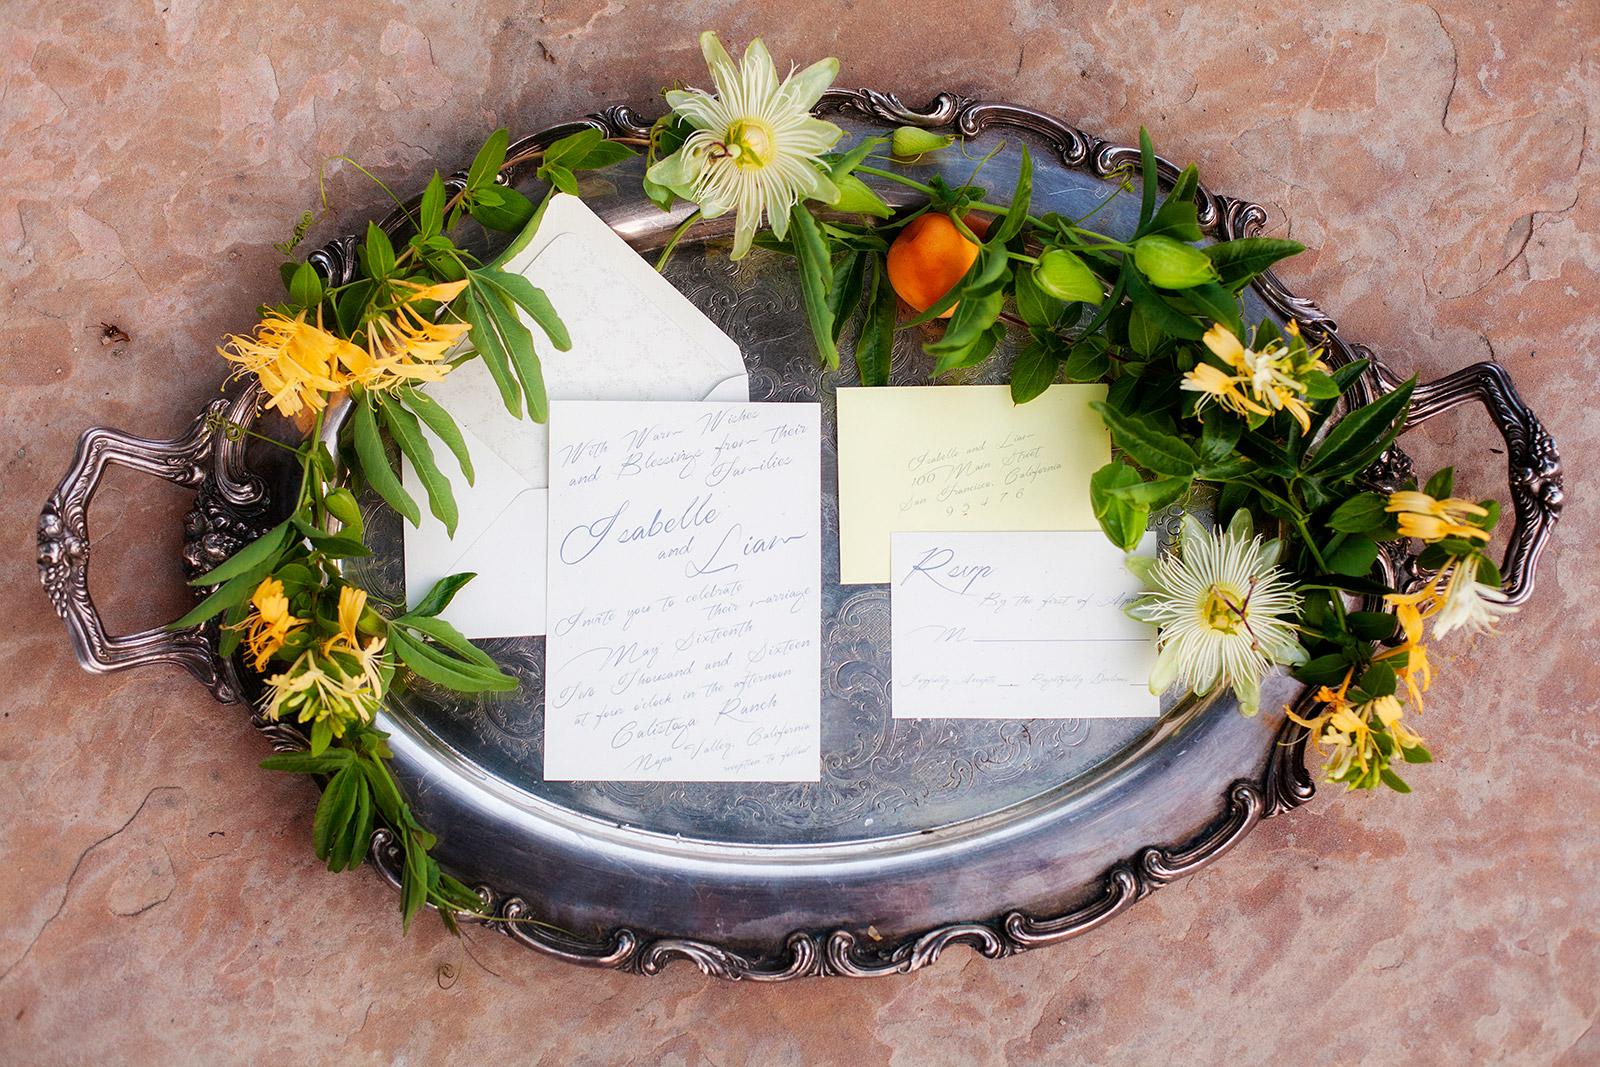 Calistoga-Ranch-Wedding-9.jpg